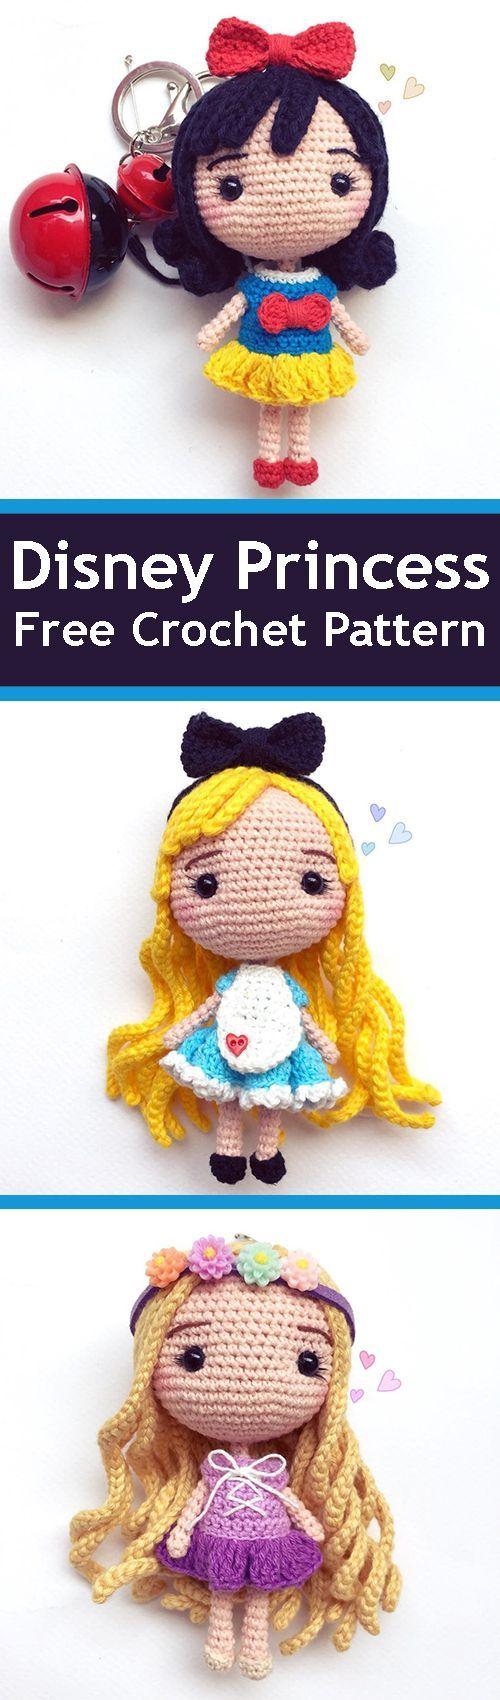 Pdf Disney Princess Free Amigurumi Crochet Pattern бесплатный